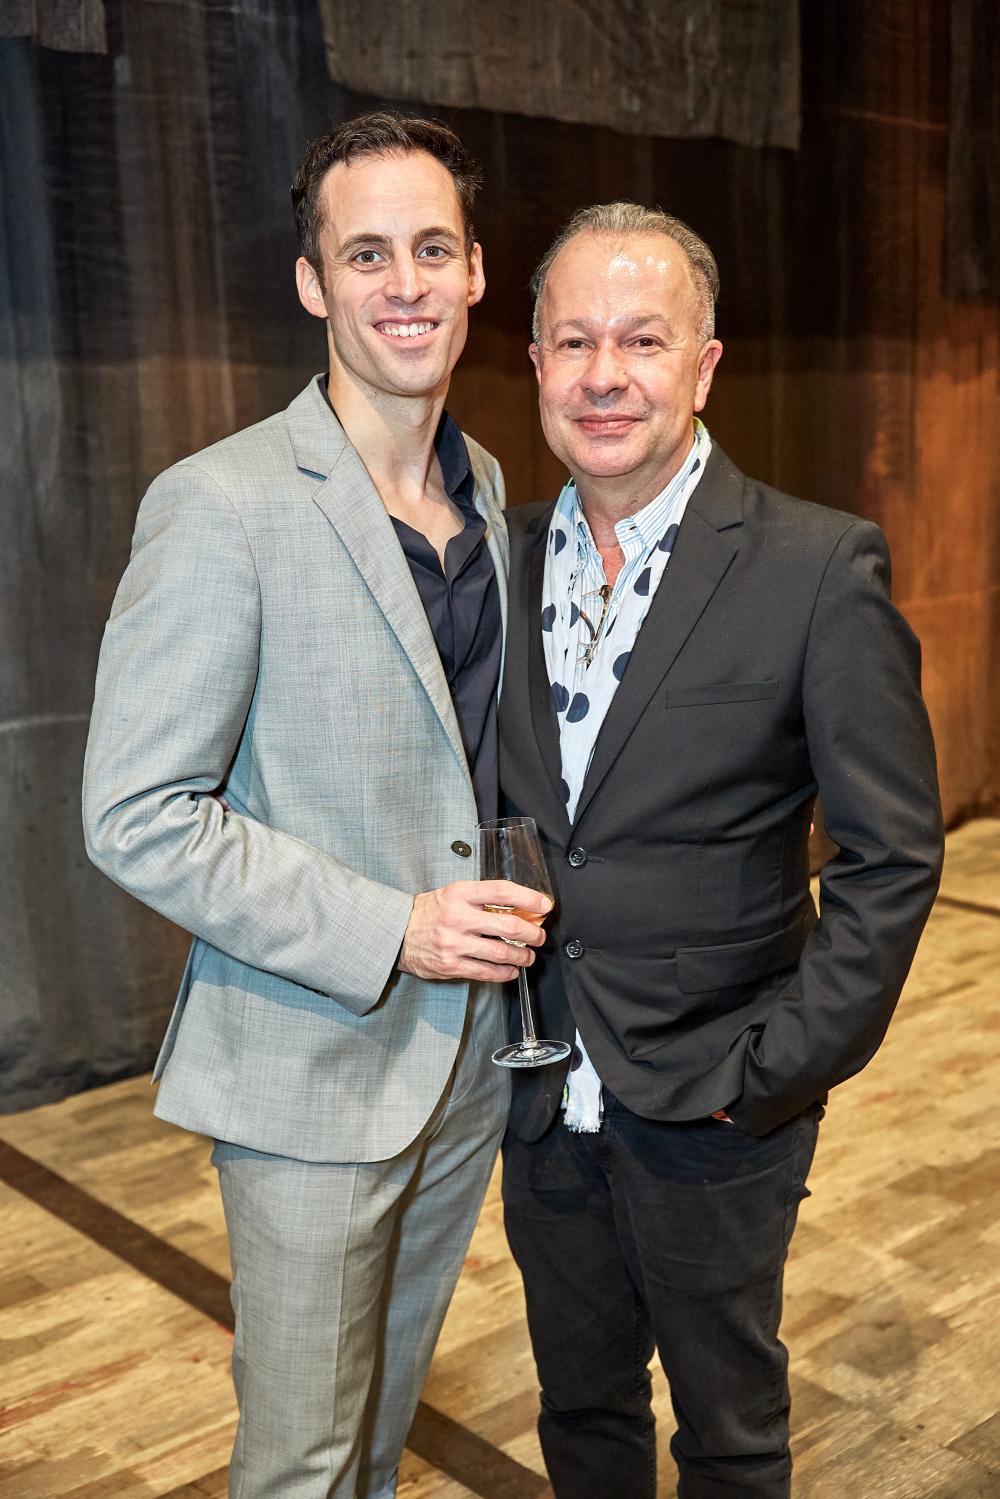 with Jaimy van Overeem. Copyright: Thomas Schulz